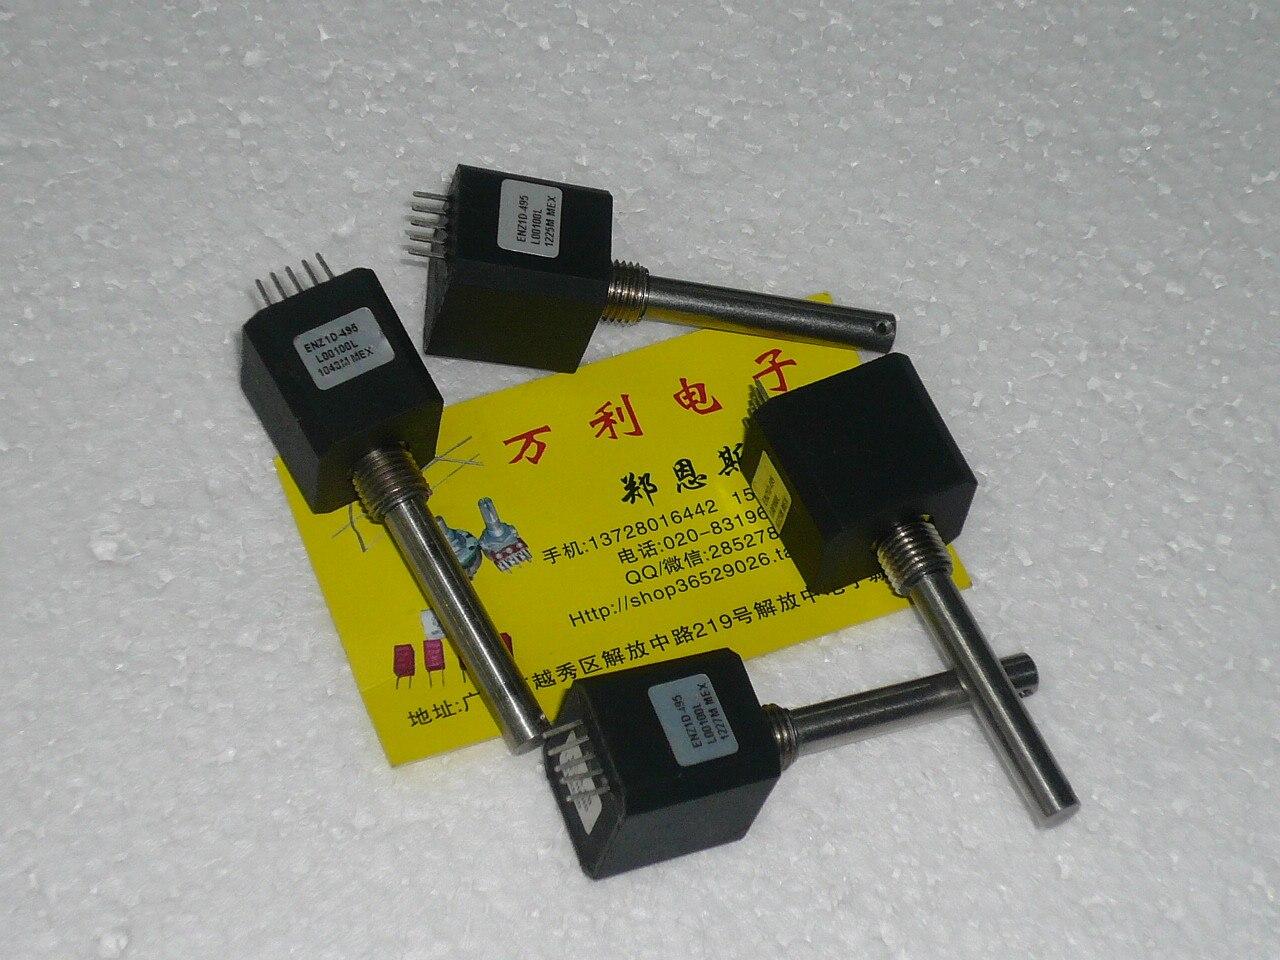 [VK] original bourns-a + B ENZ1D-495 L00100L 1227 M 5 ligne encodeur optique[VK] original bourns-a + B ENZ1D-495 L00100L 1227 M 5 ligne encodeur optique